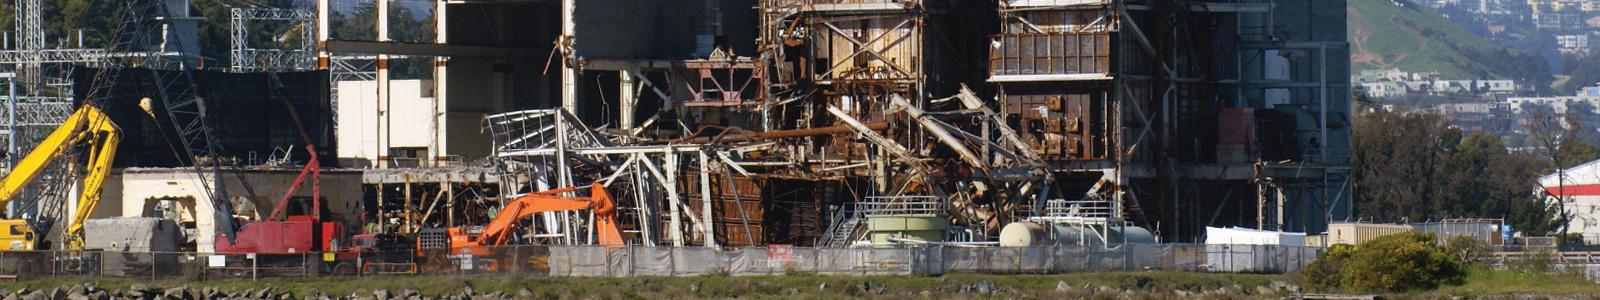 lvi-demolition-abatement-facility-response-services